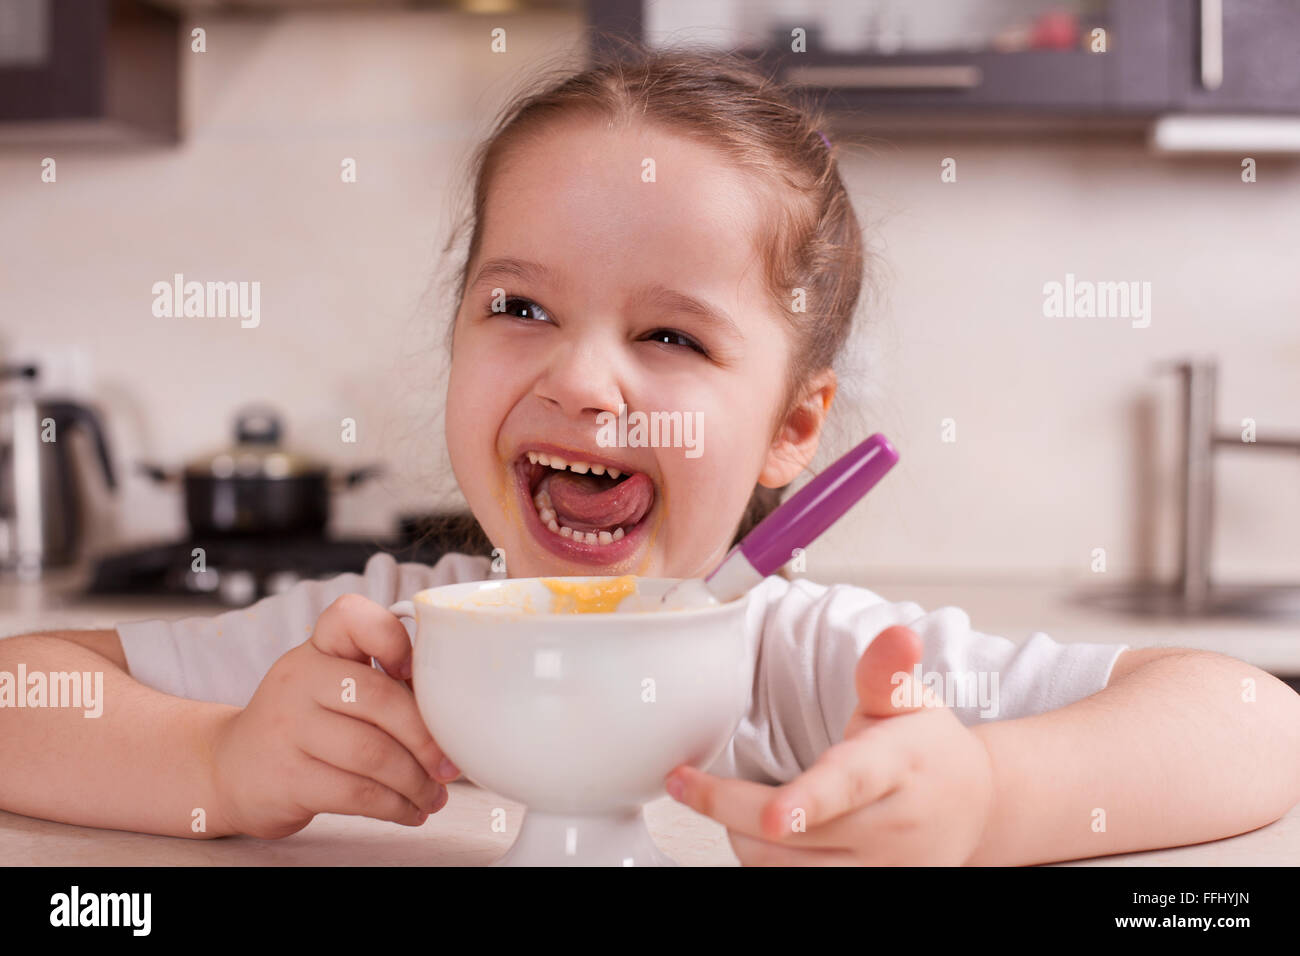 Girl spoiled and naughty food. Stock image. - Stock Image